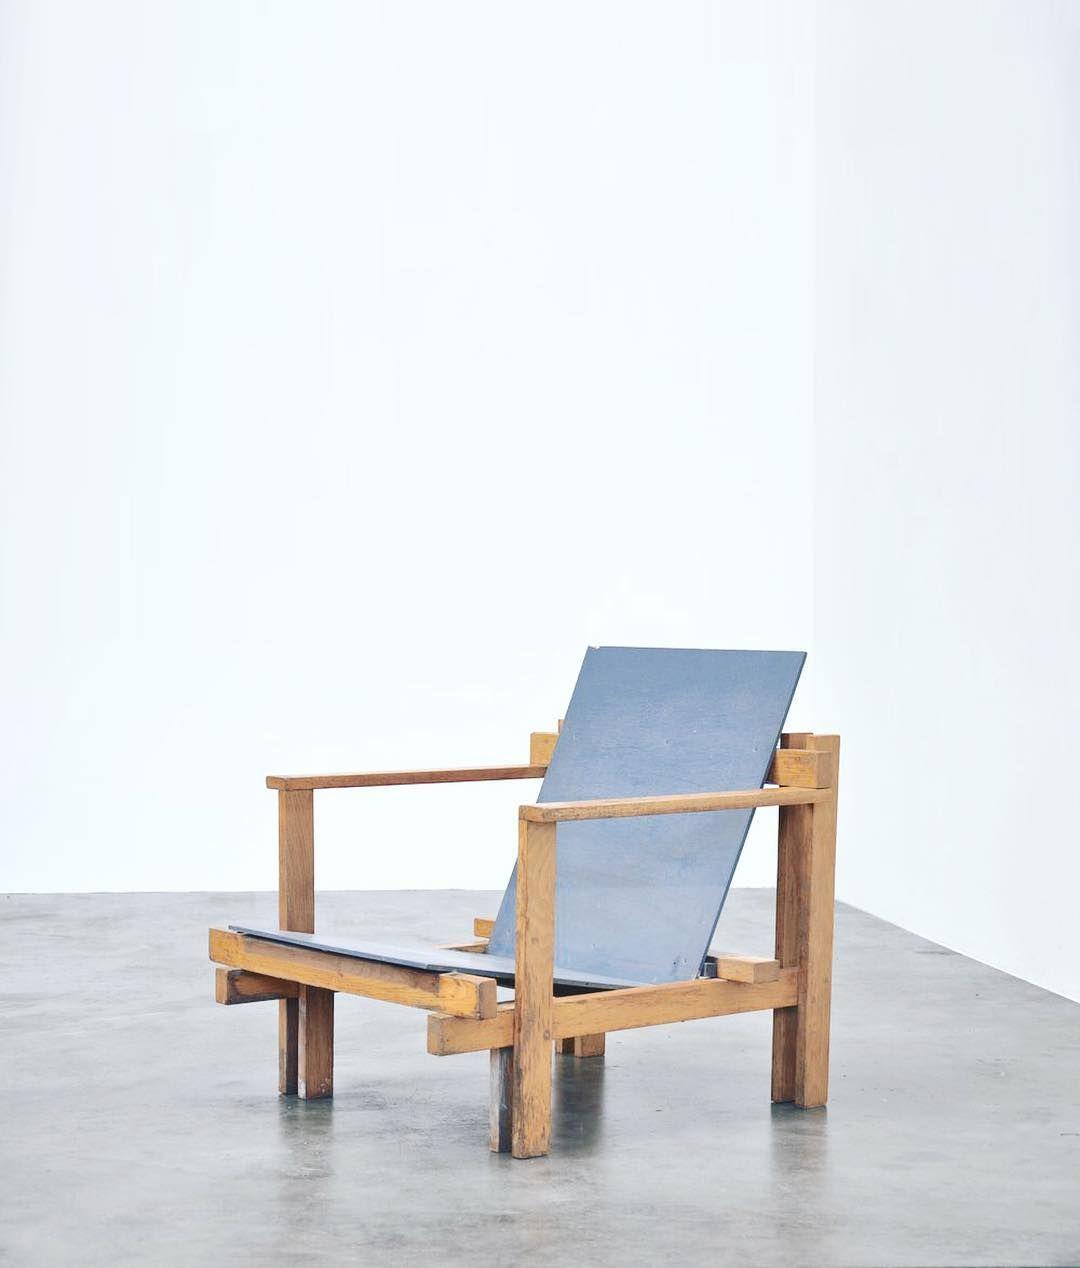 Jan de jong modernist chair 1960 for sale on www midmod design com